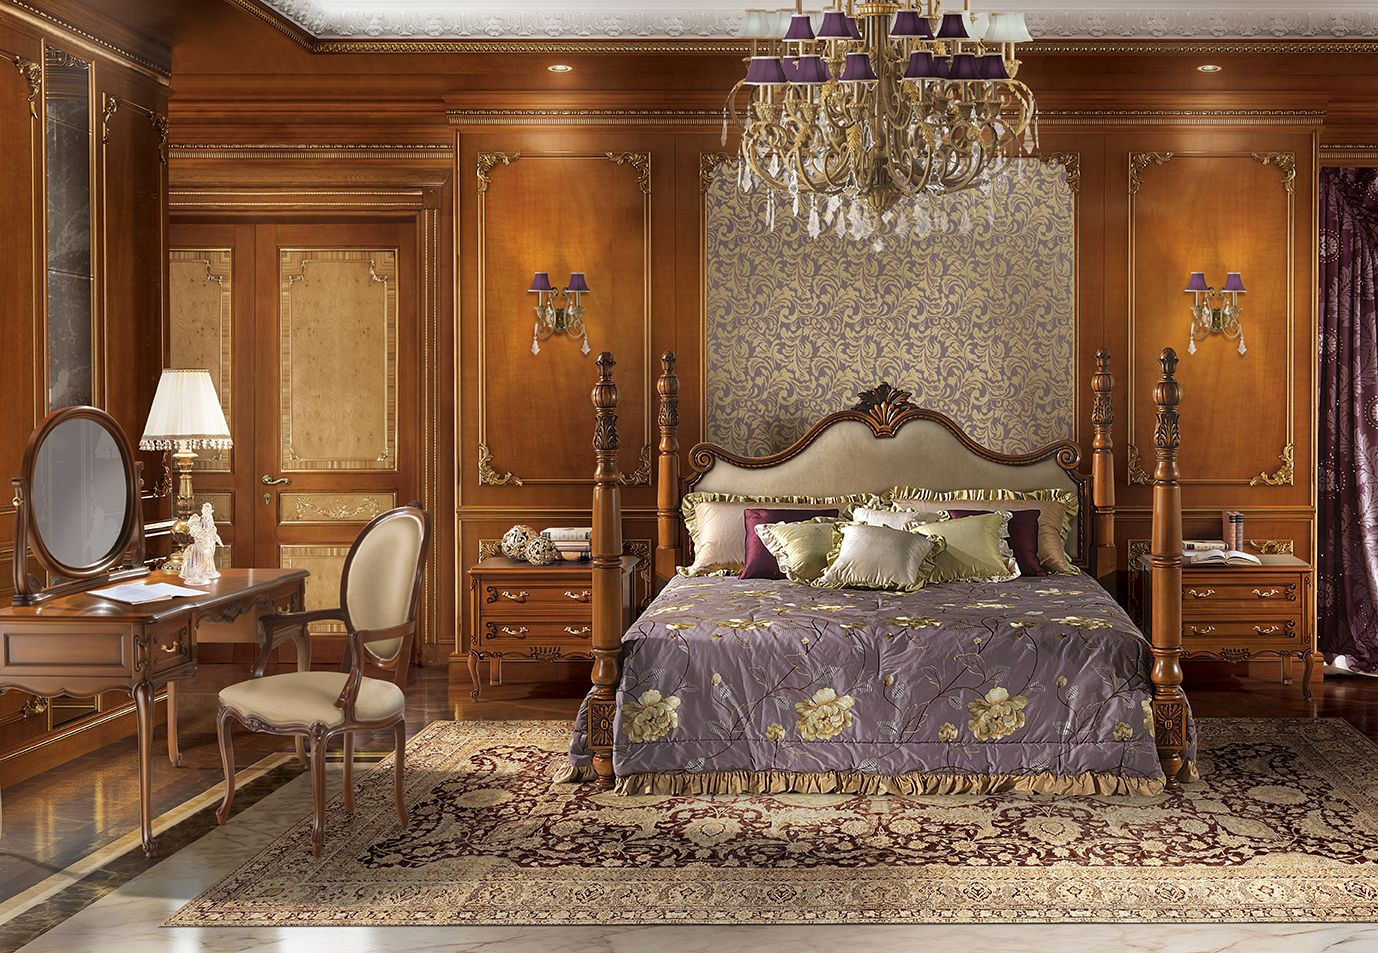 Brahms Luxury Italian Charming Bed Luxury Italian Furniture Bedroom Design Home Decor Luxury italian bedroom furniture